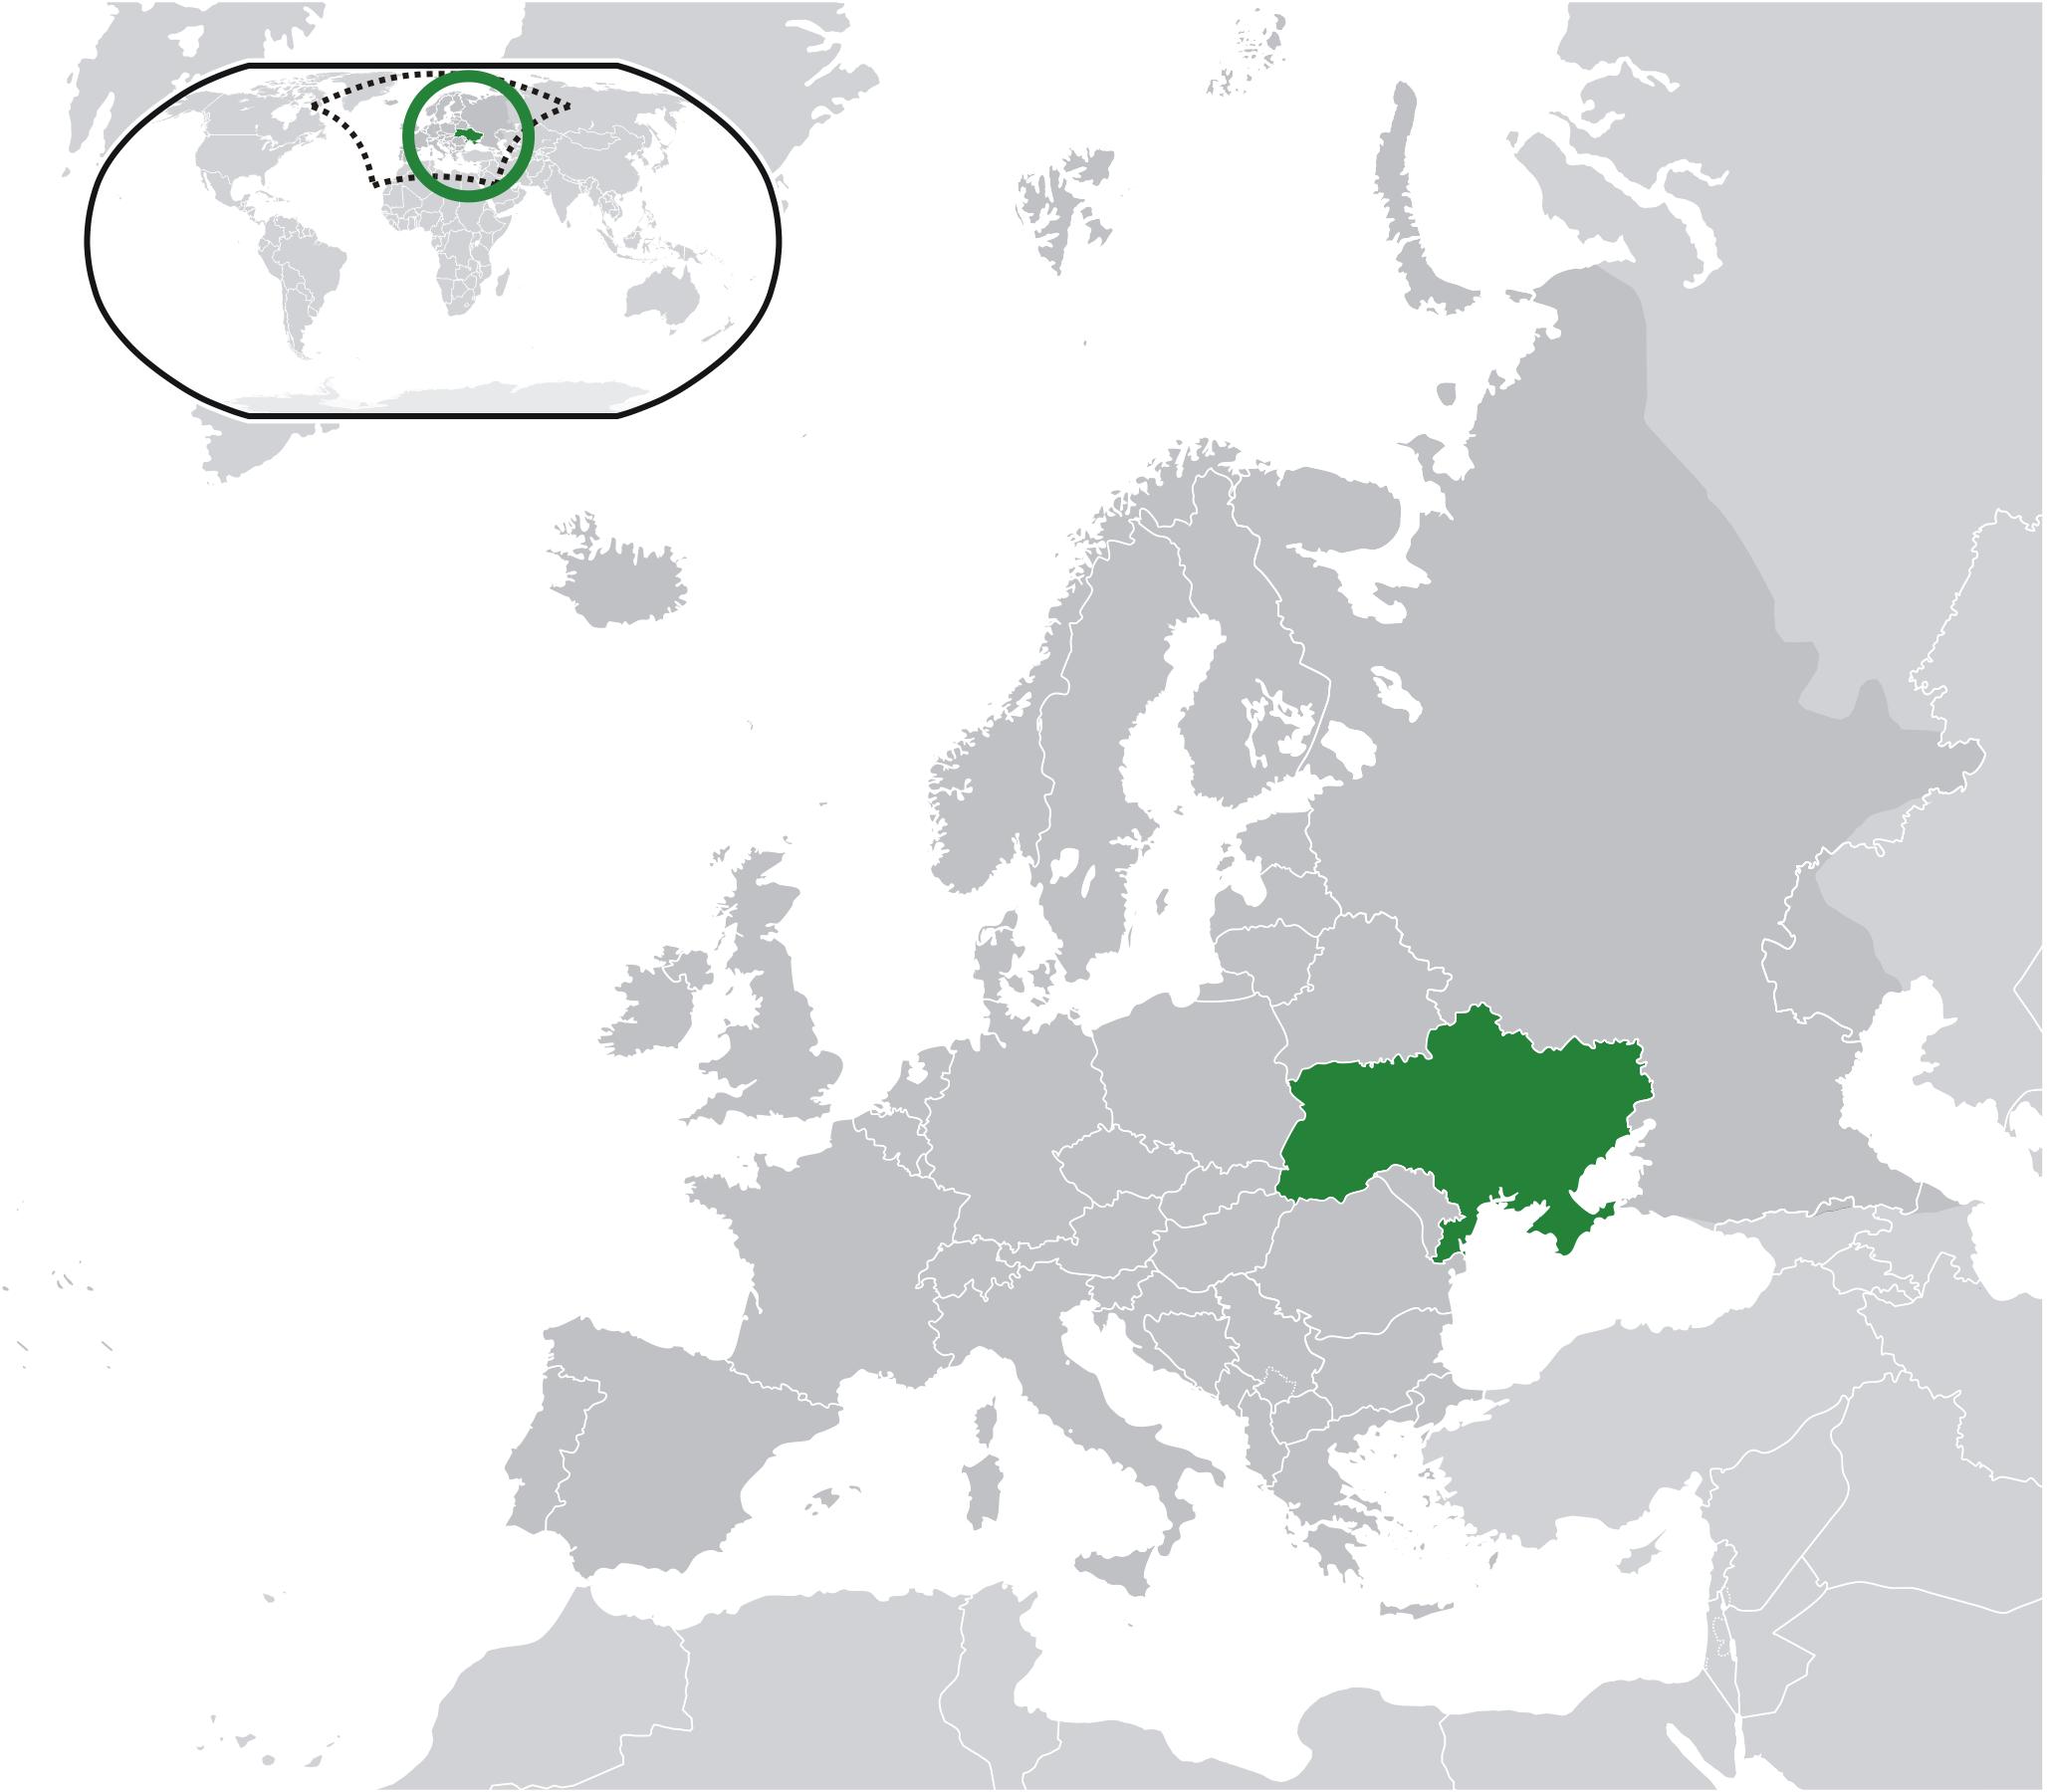 FileLocation Ukraine Europepng Wikimedia Commons